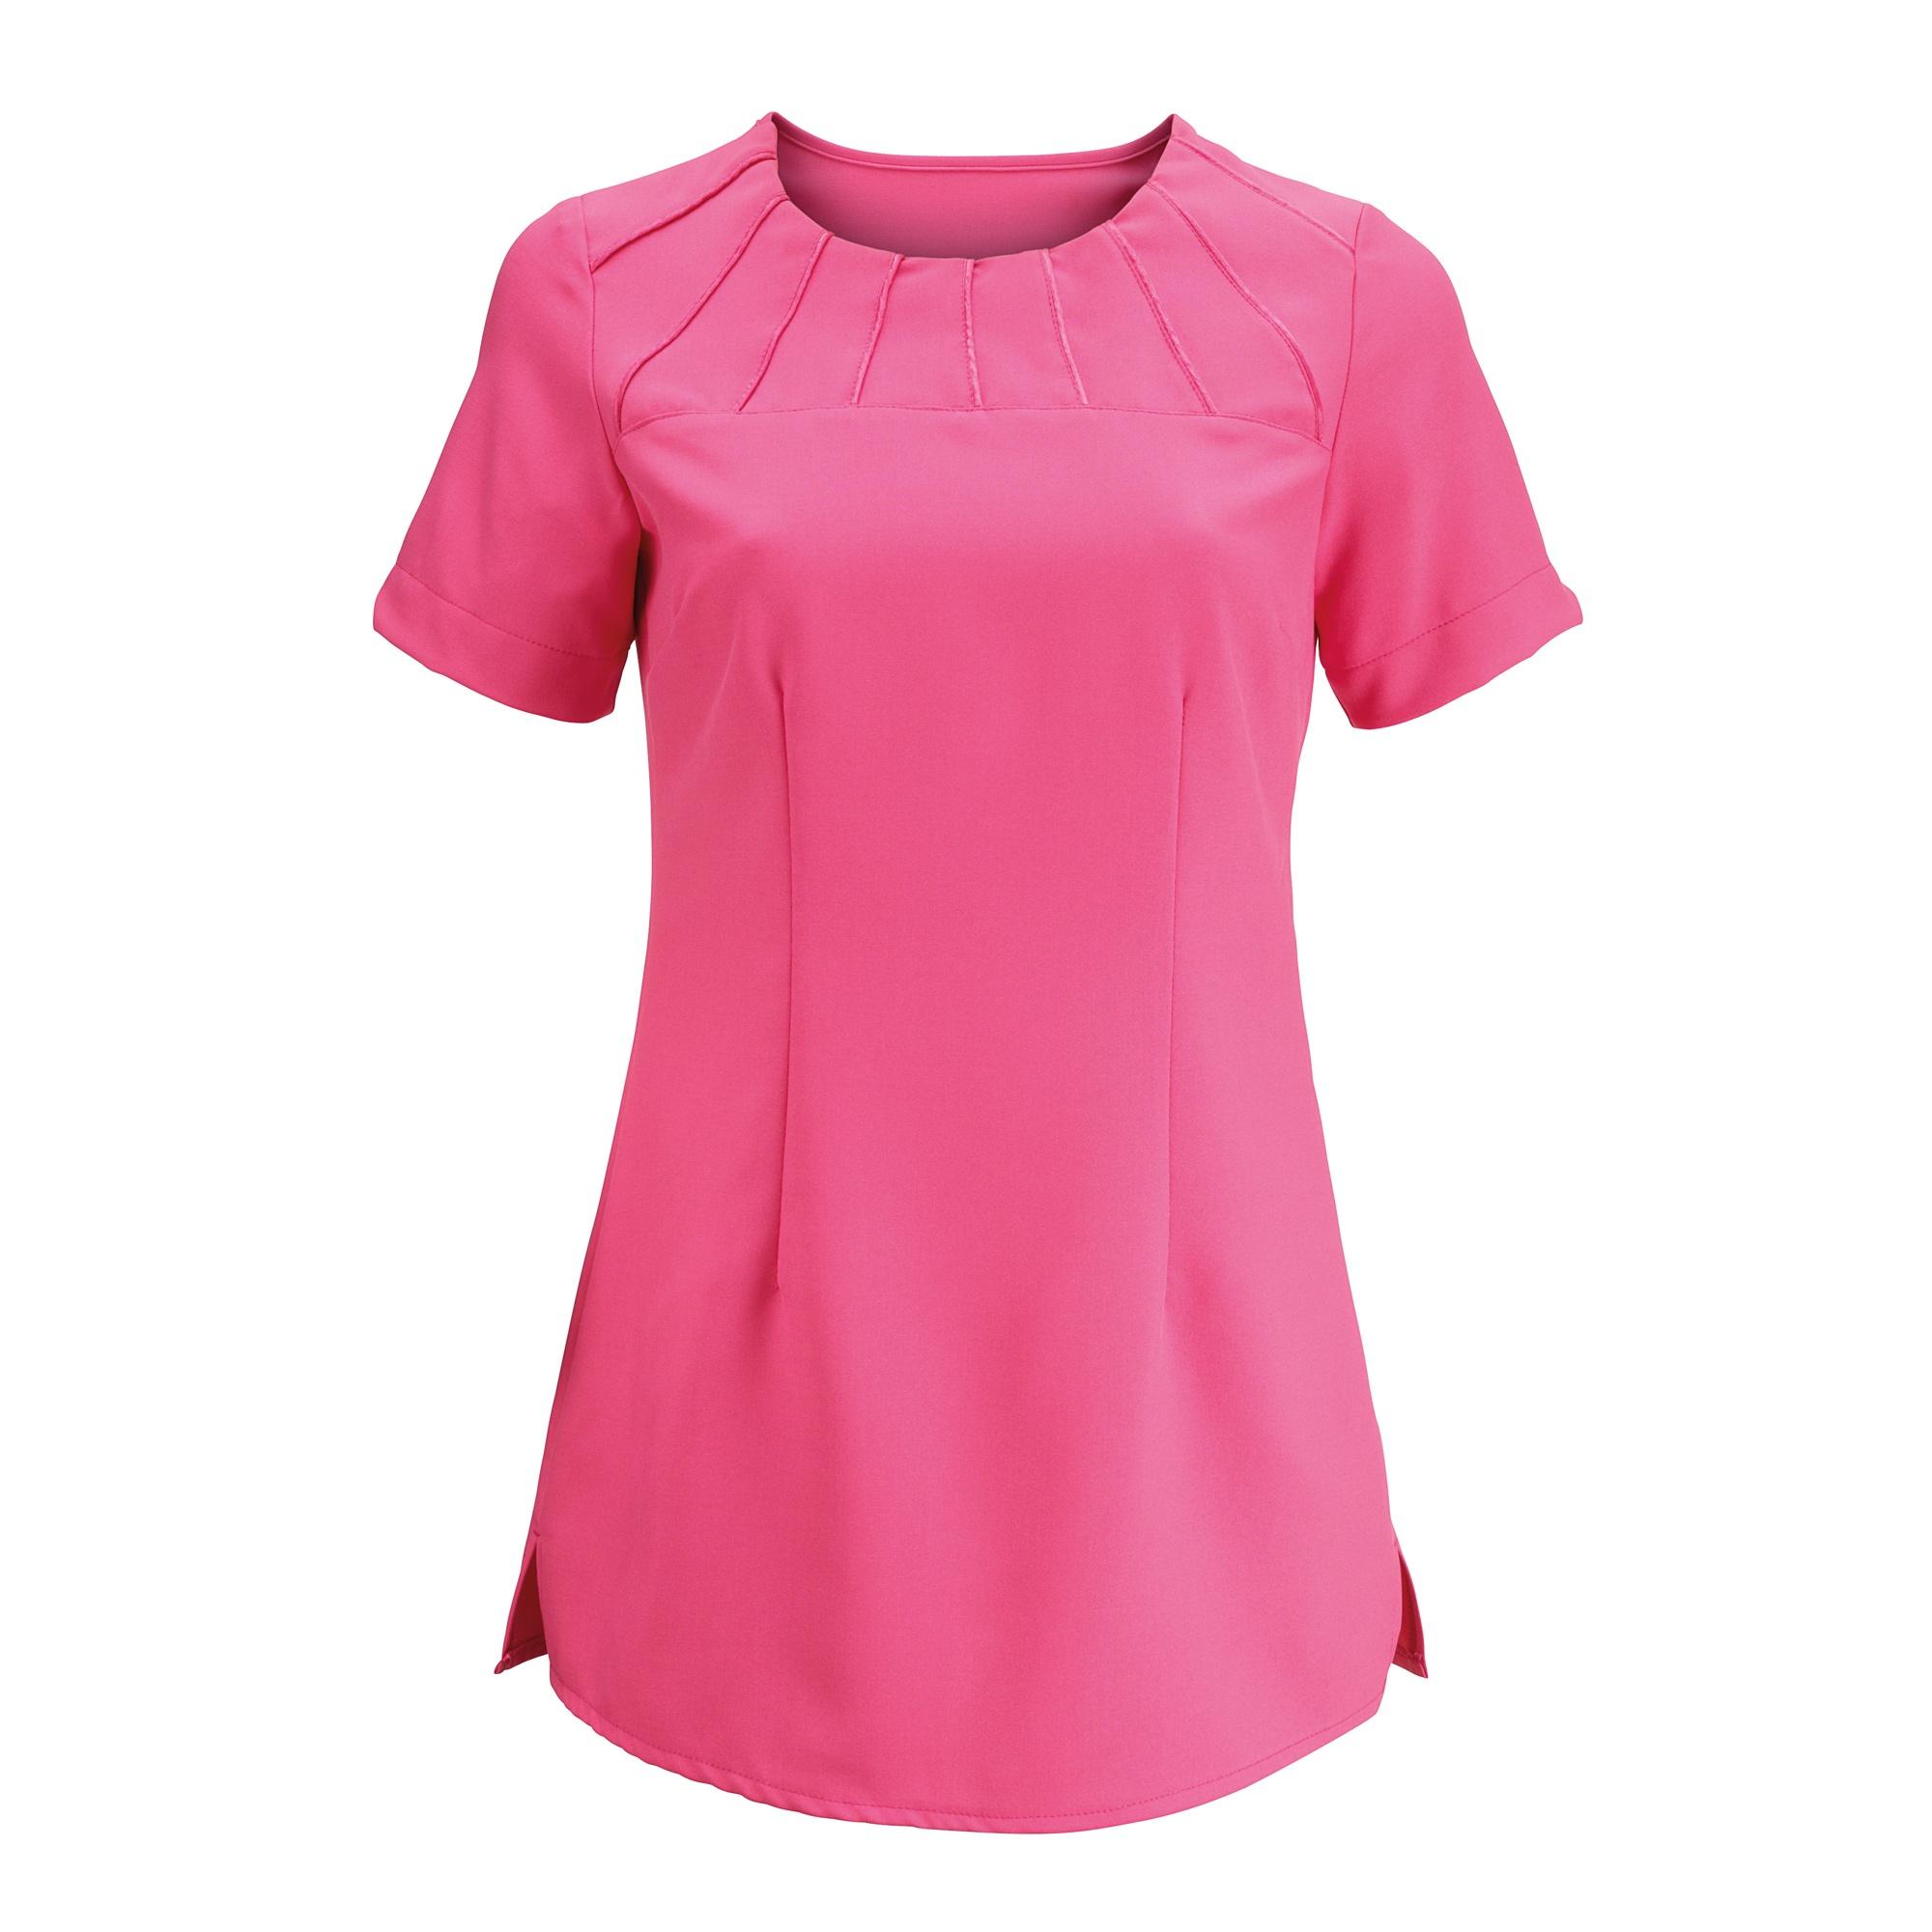 Alexandra Womens Satin Trim Tunic / Health Beauty & Spa / Workwear (Pack of 2) (18) (Hot Pink)